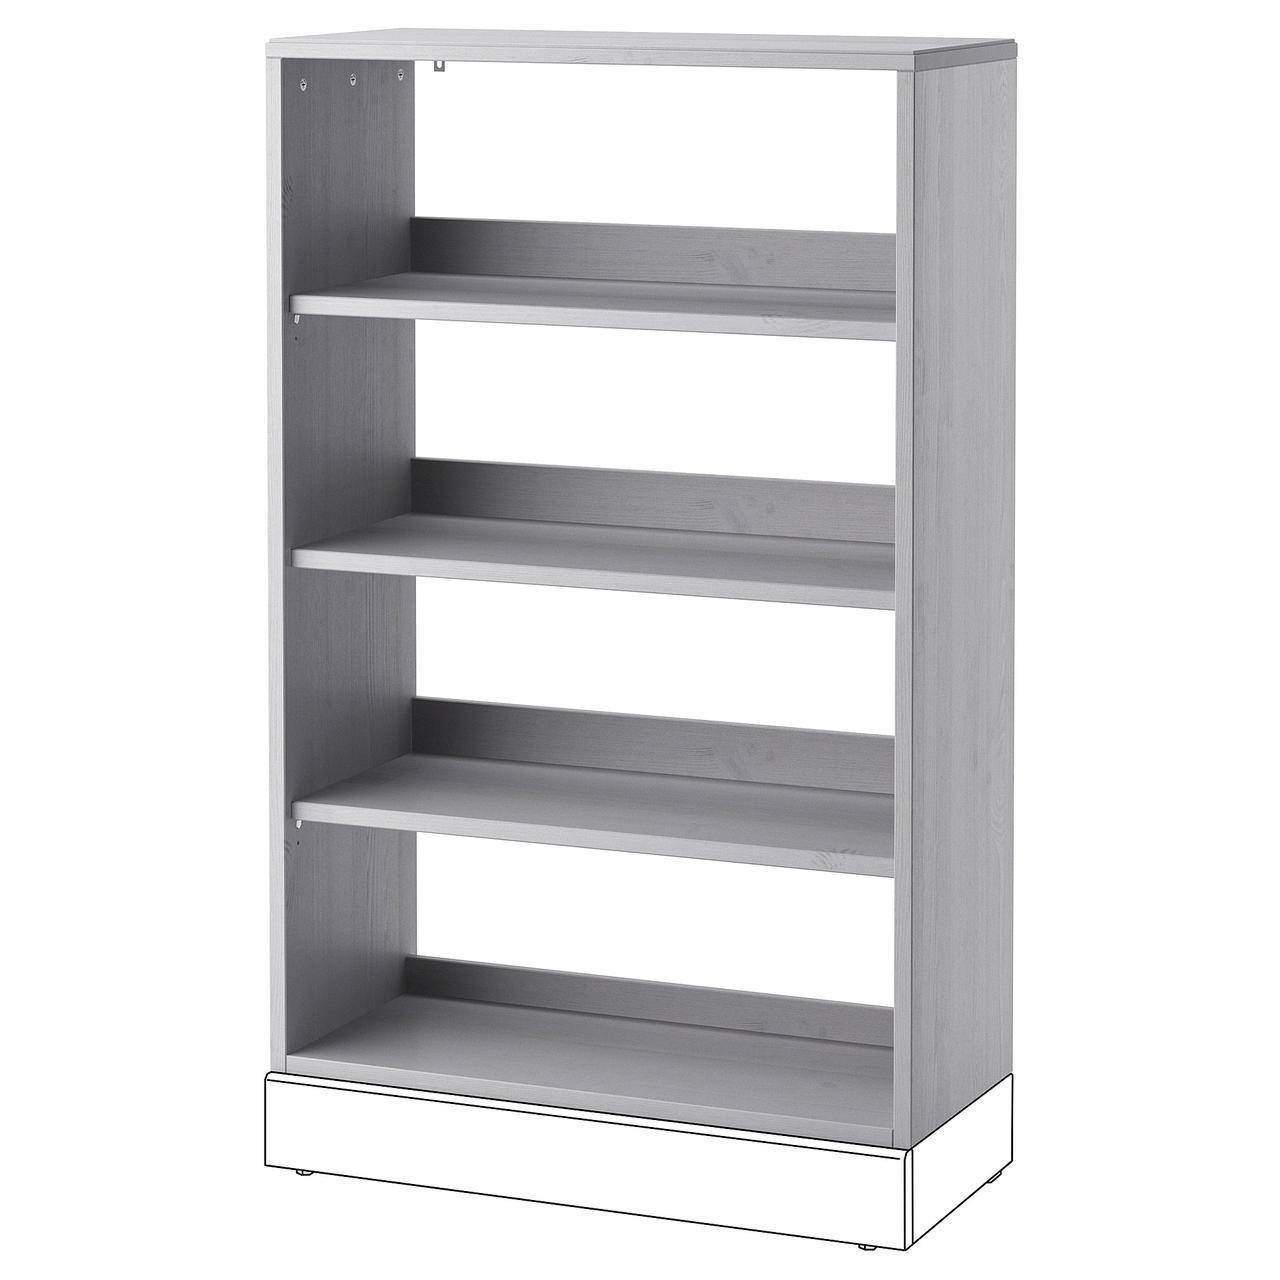 Стеллаж IKEA HAVSTA 81x123x35 см серый 204.151.93